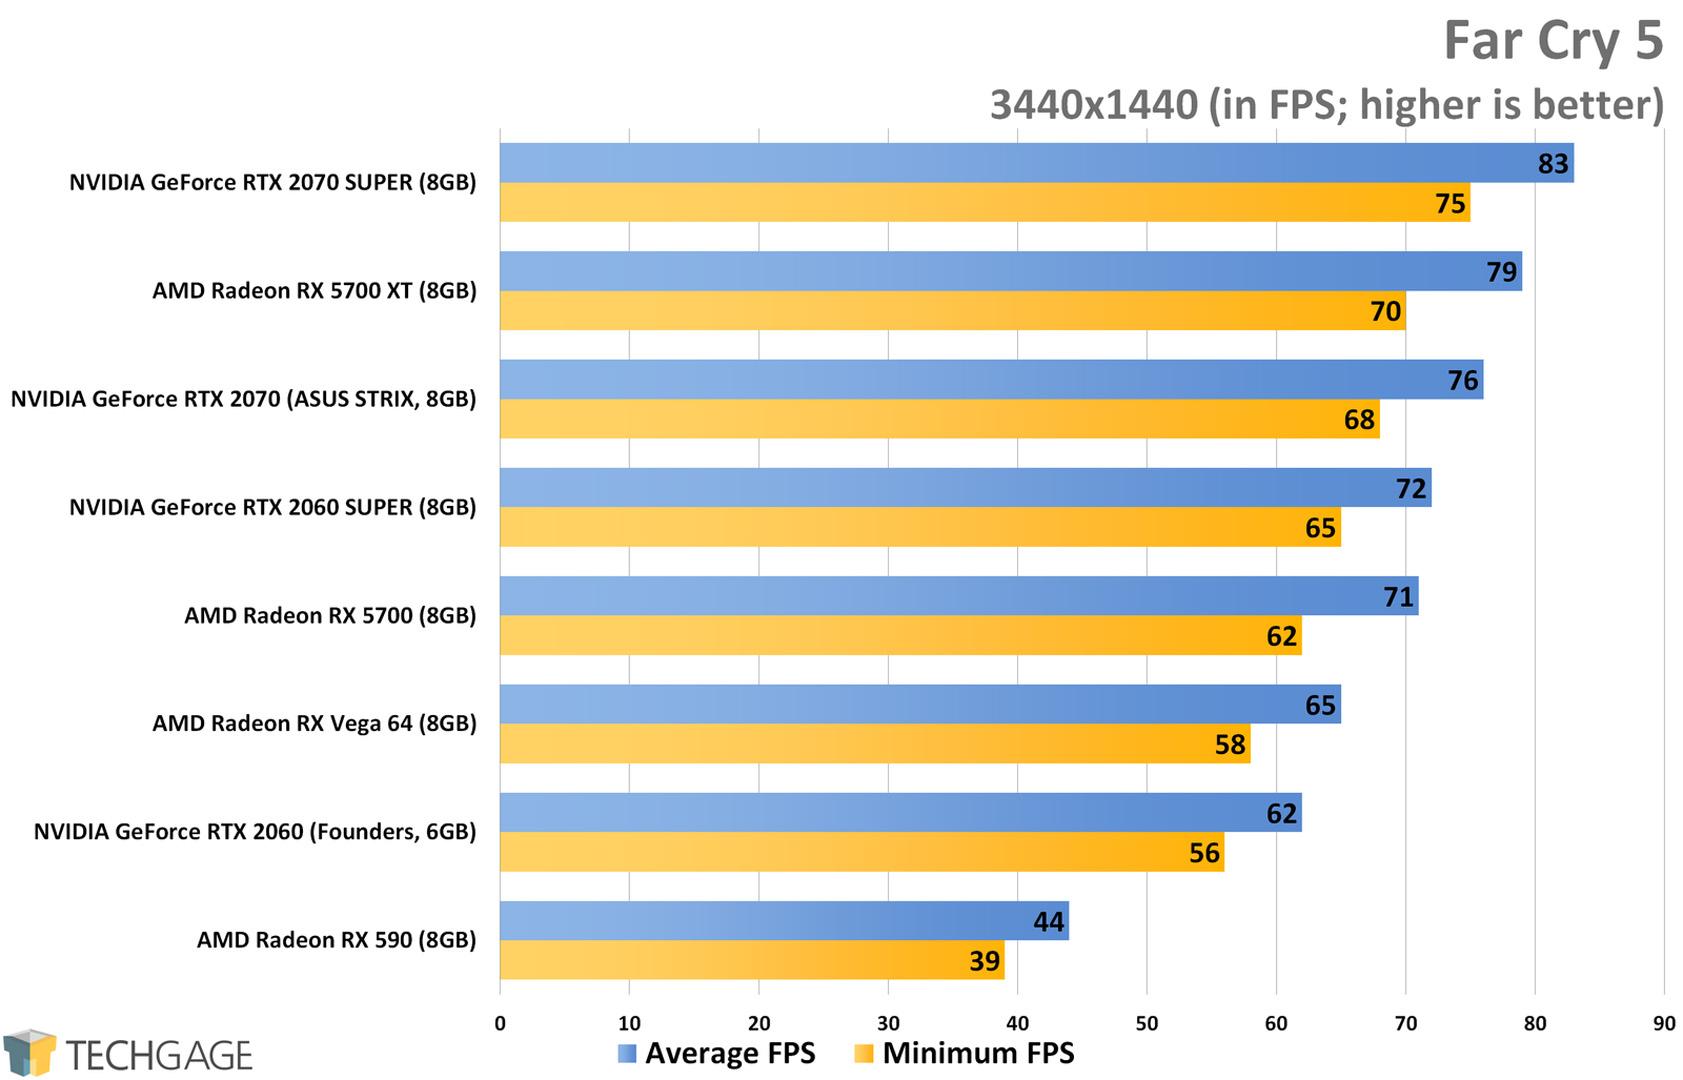 Far Cry 5 (3440x1440 Ultrawide) - AMD Radeon RX 5700 XT and RX 5700 Performance